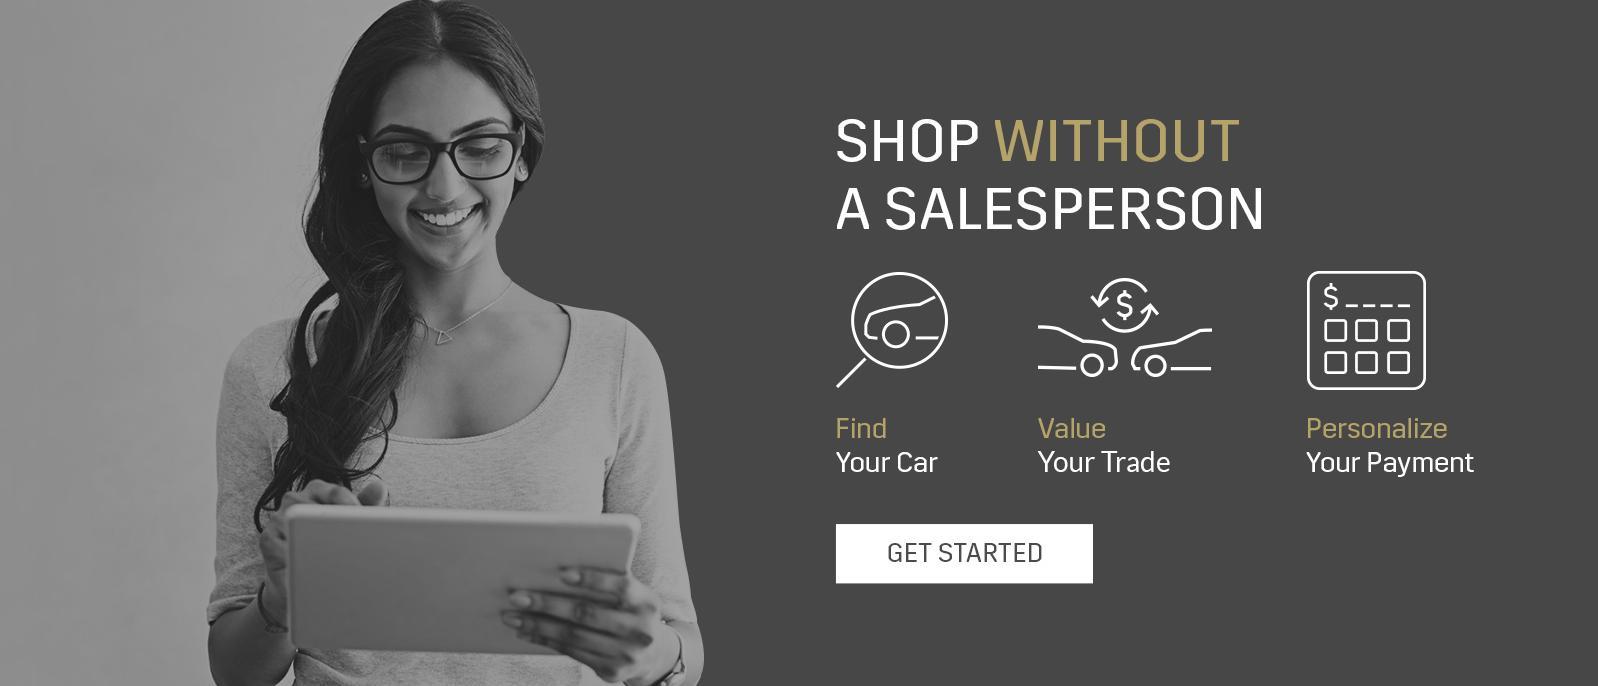 Shop Without a Sales Person